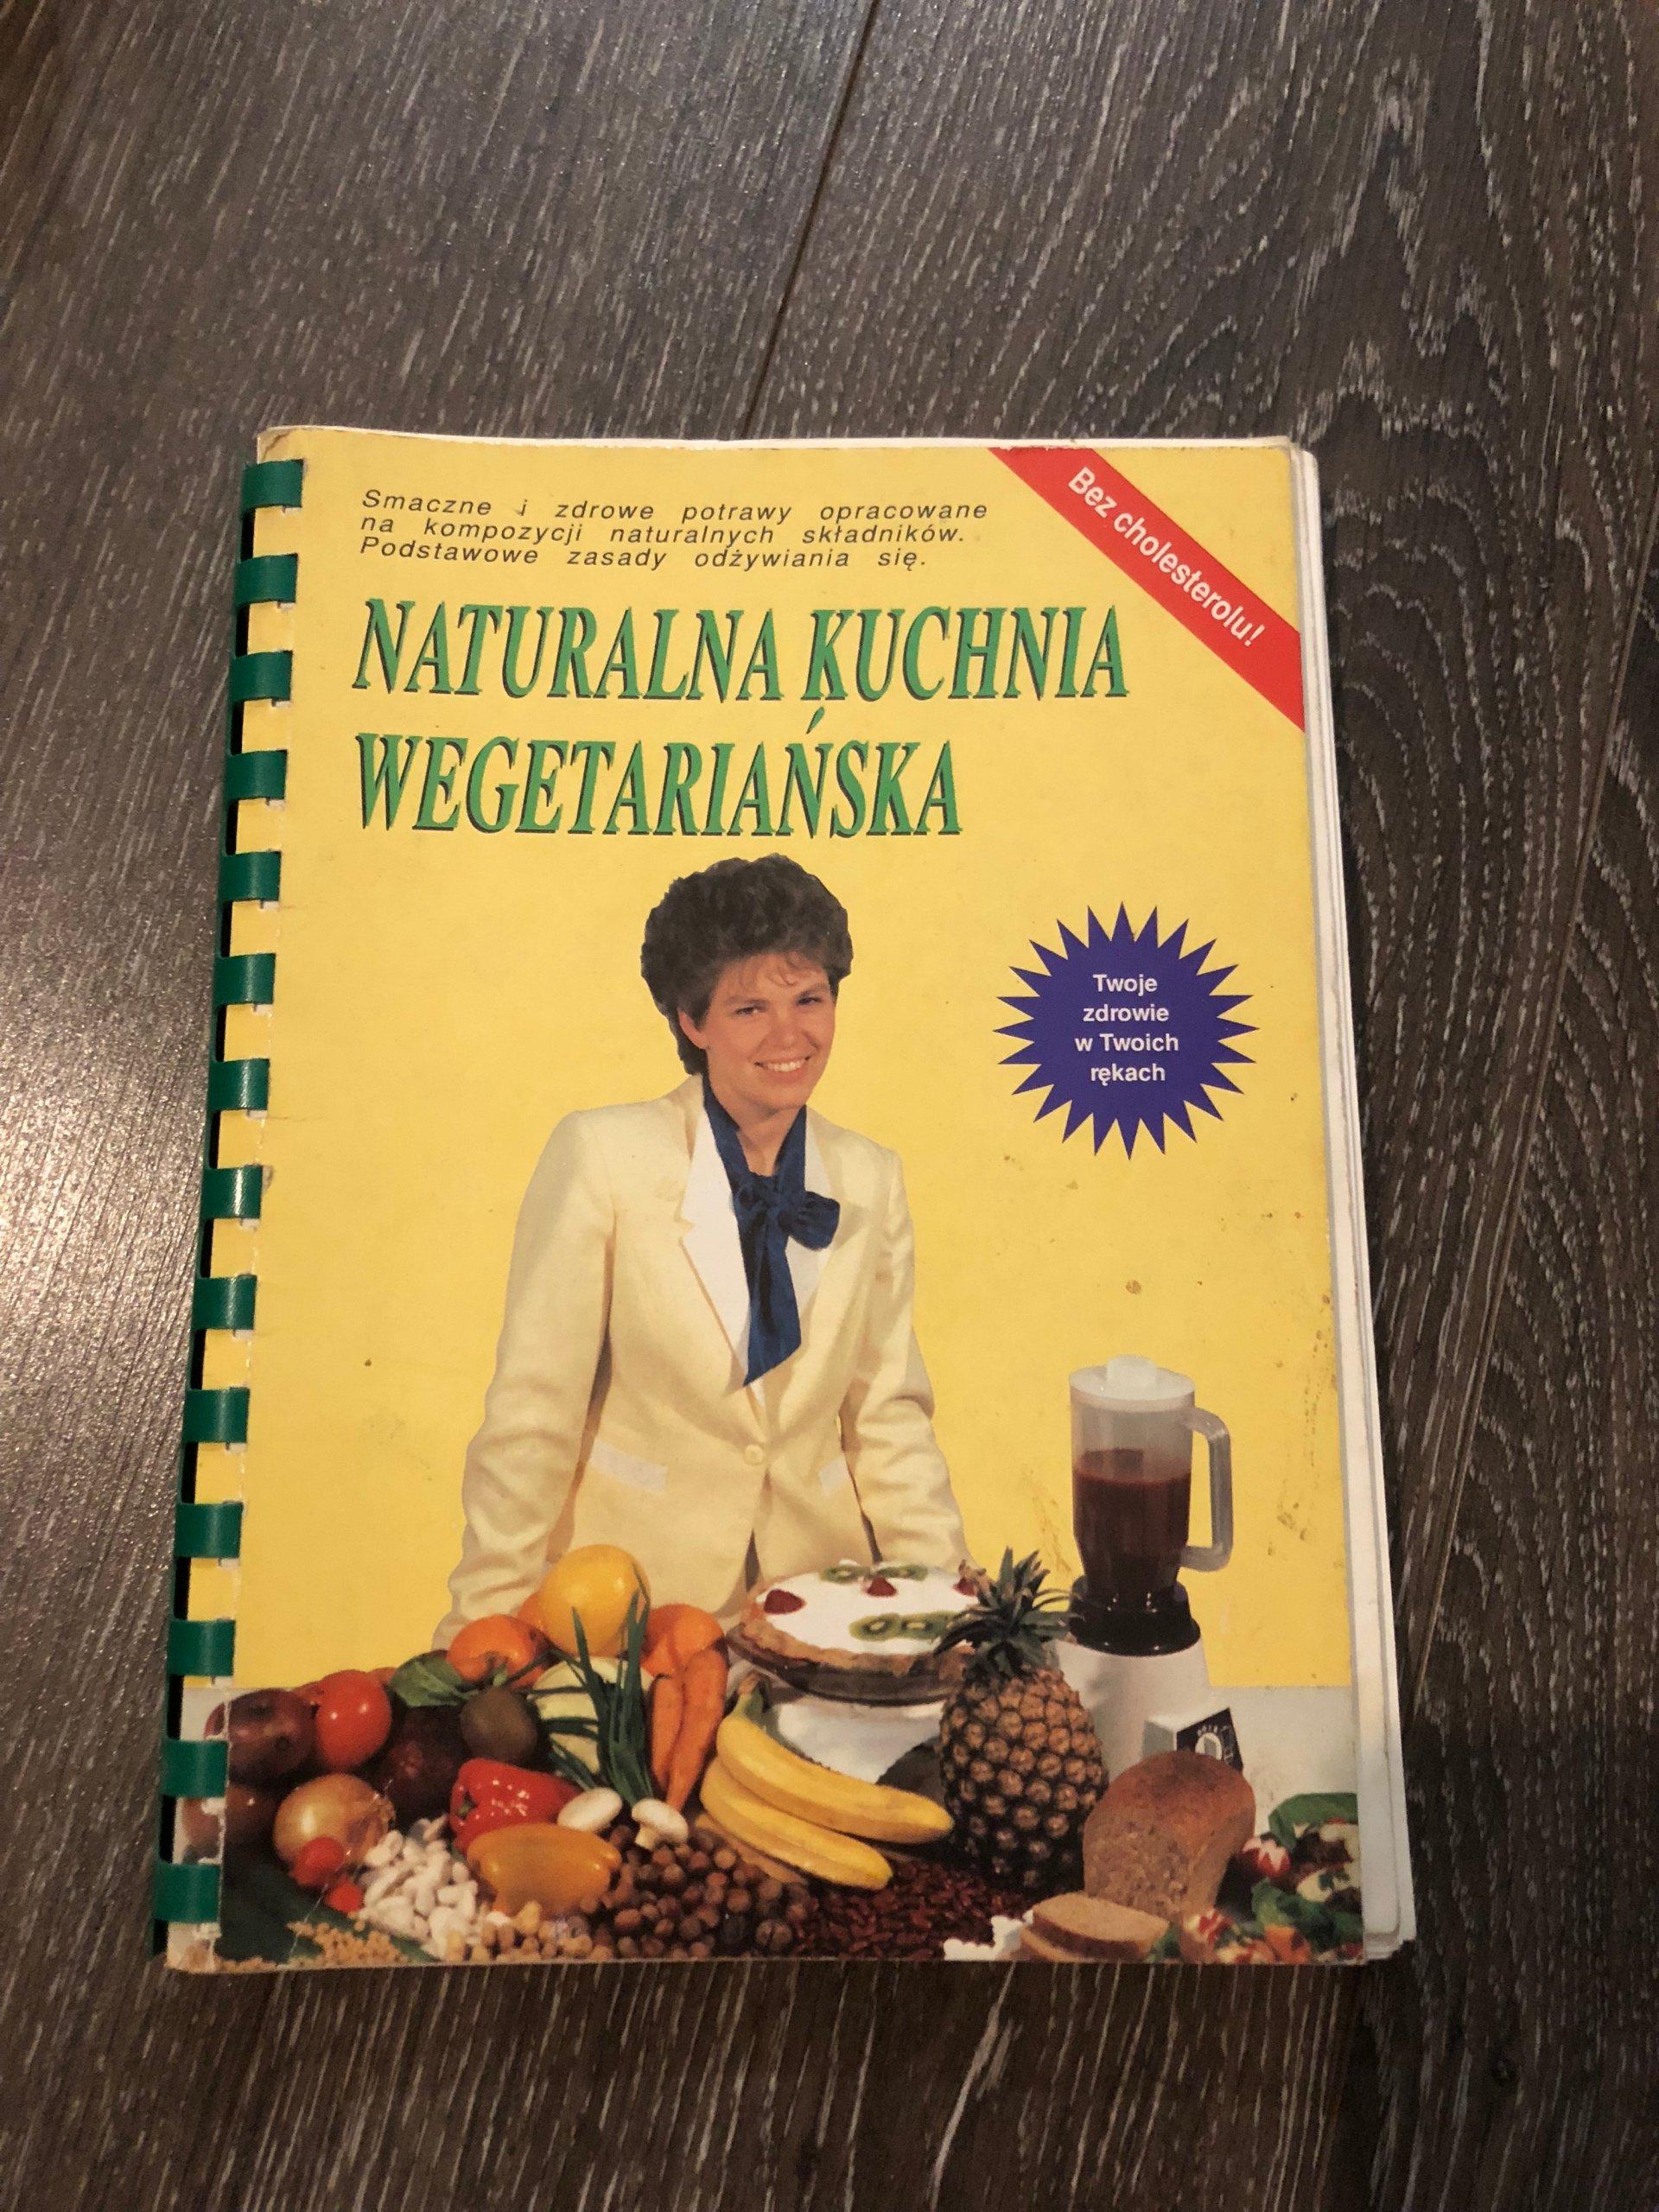 Naturalna Kuchnia Wegetarianska 1992 7195538084 Oficjalne